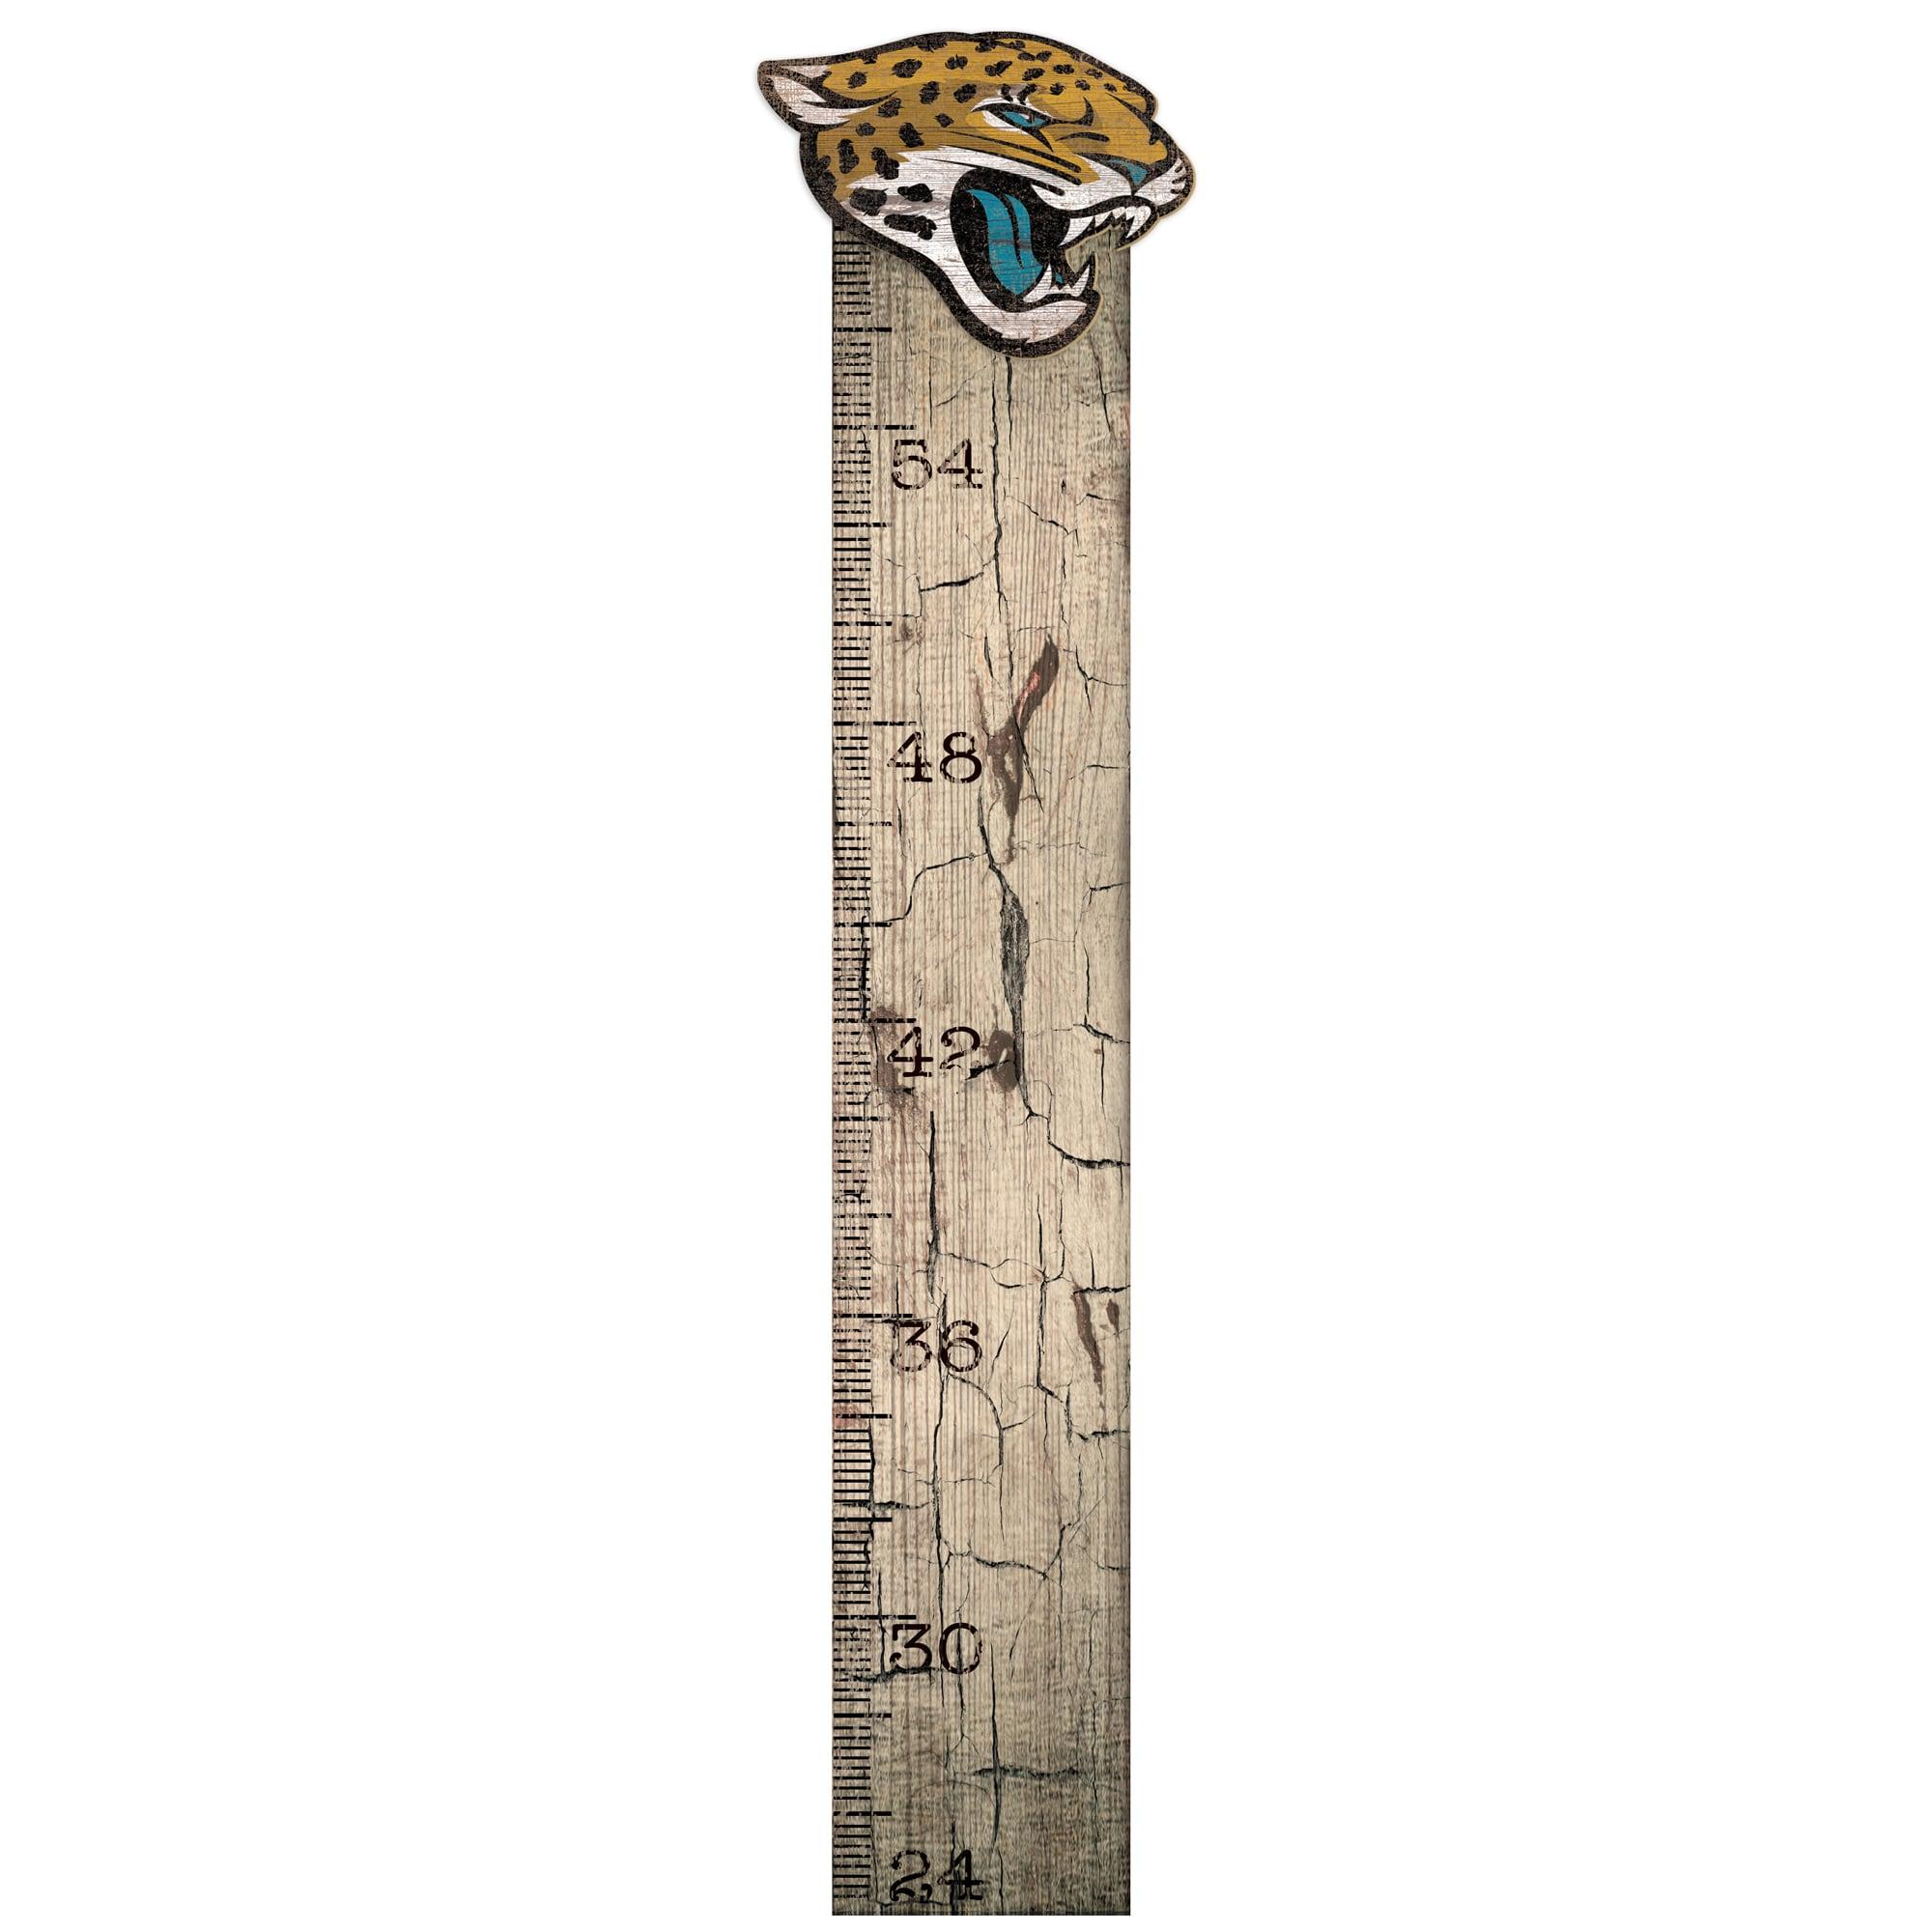 "Jacksonville Jaguars 6"" x 36"" Growth Chart Sign"